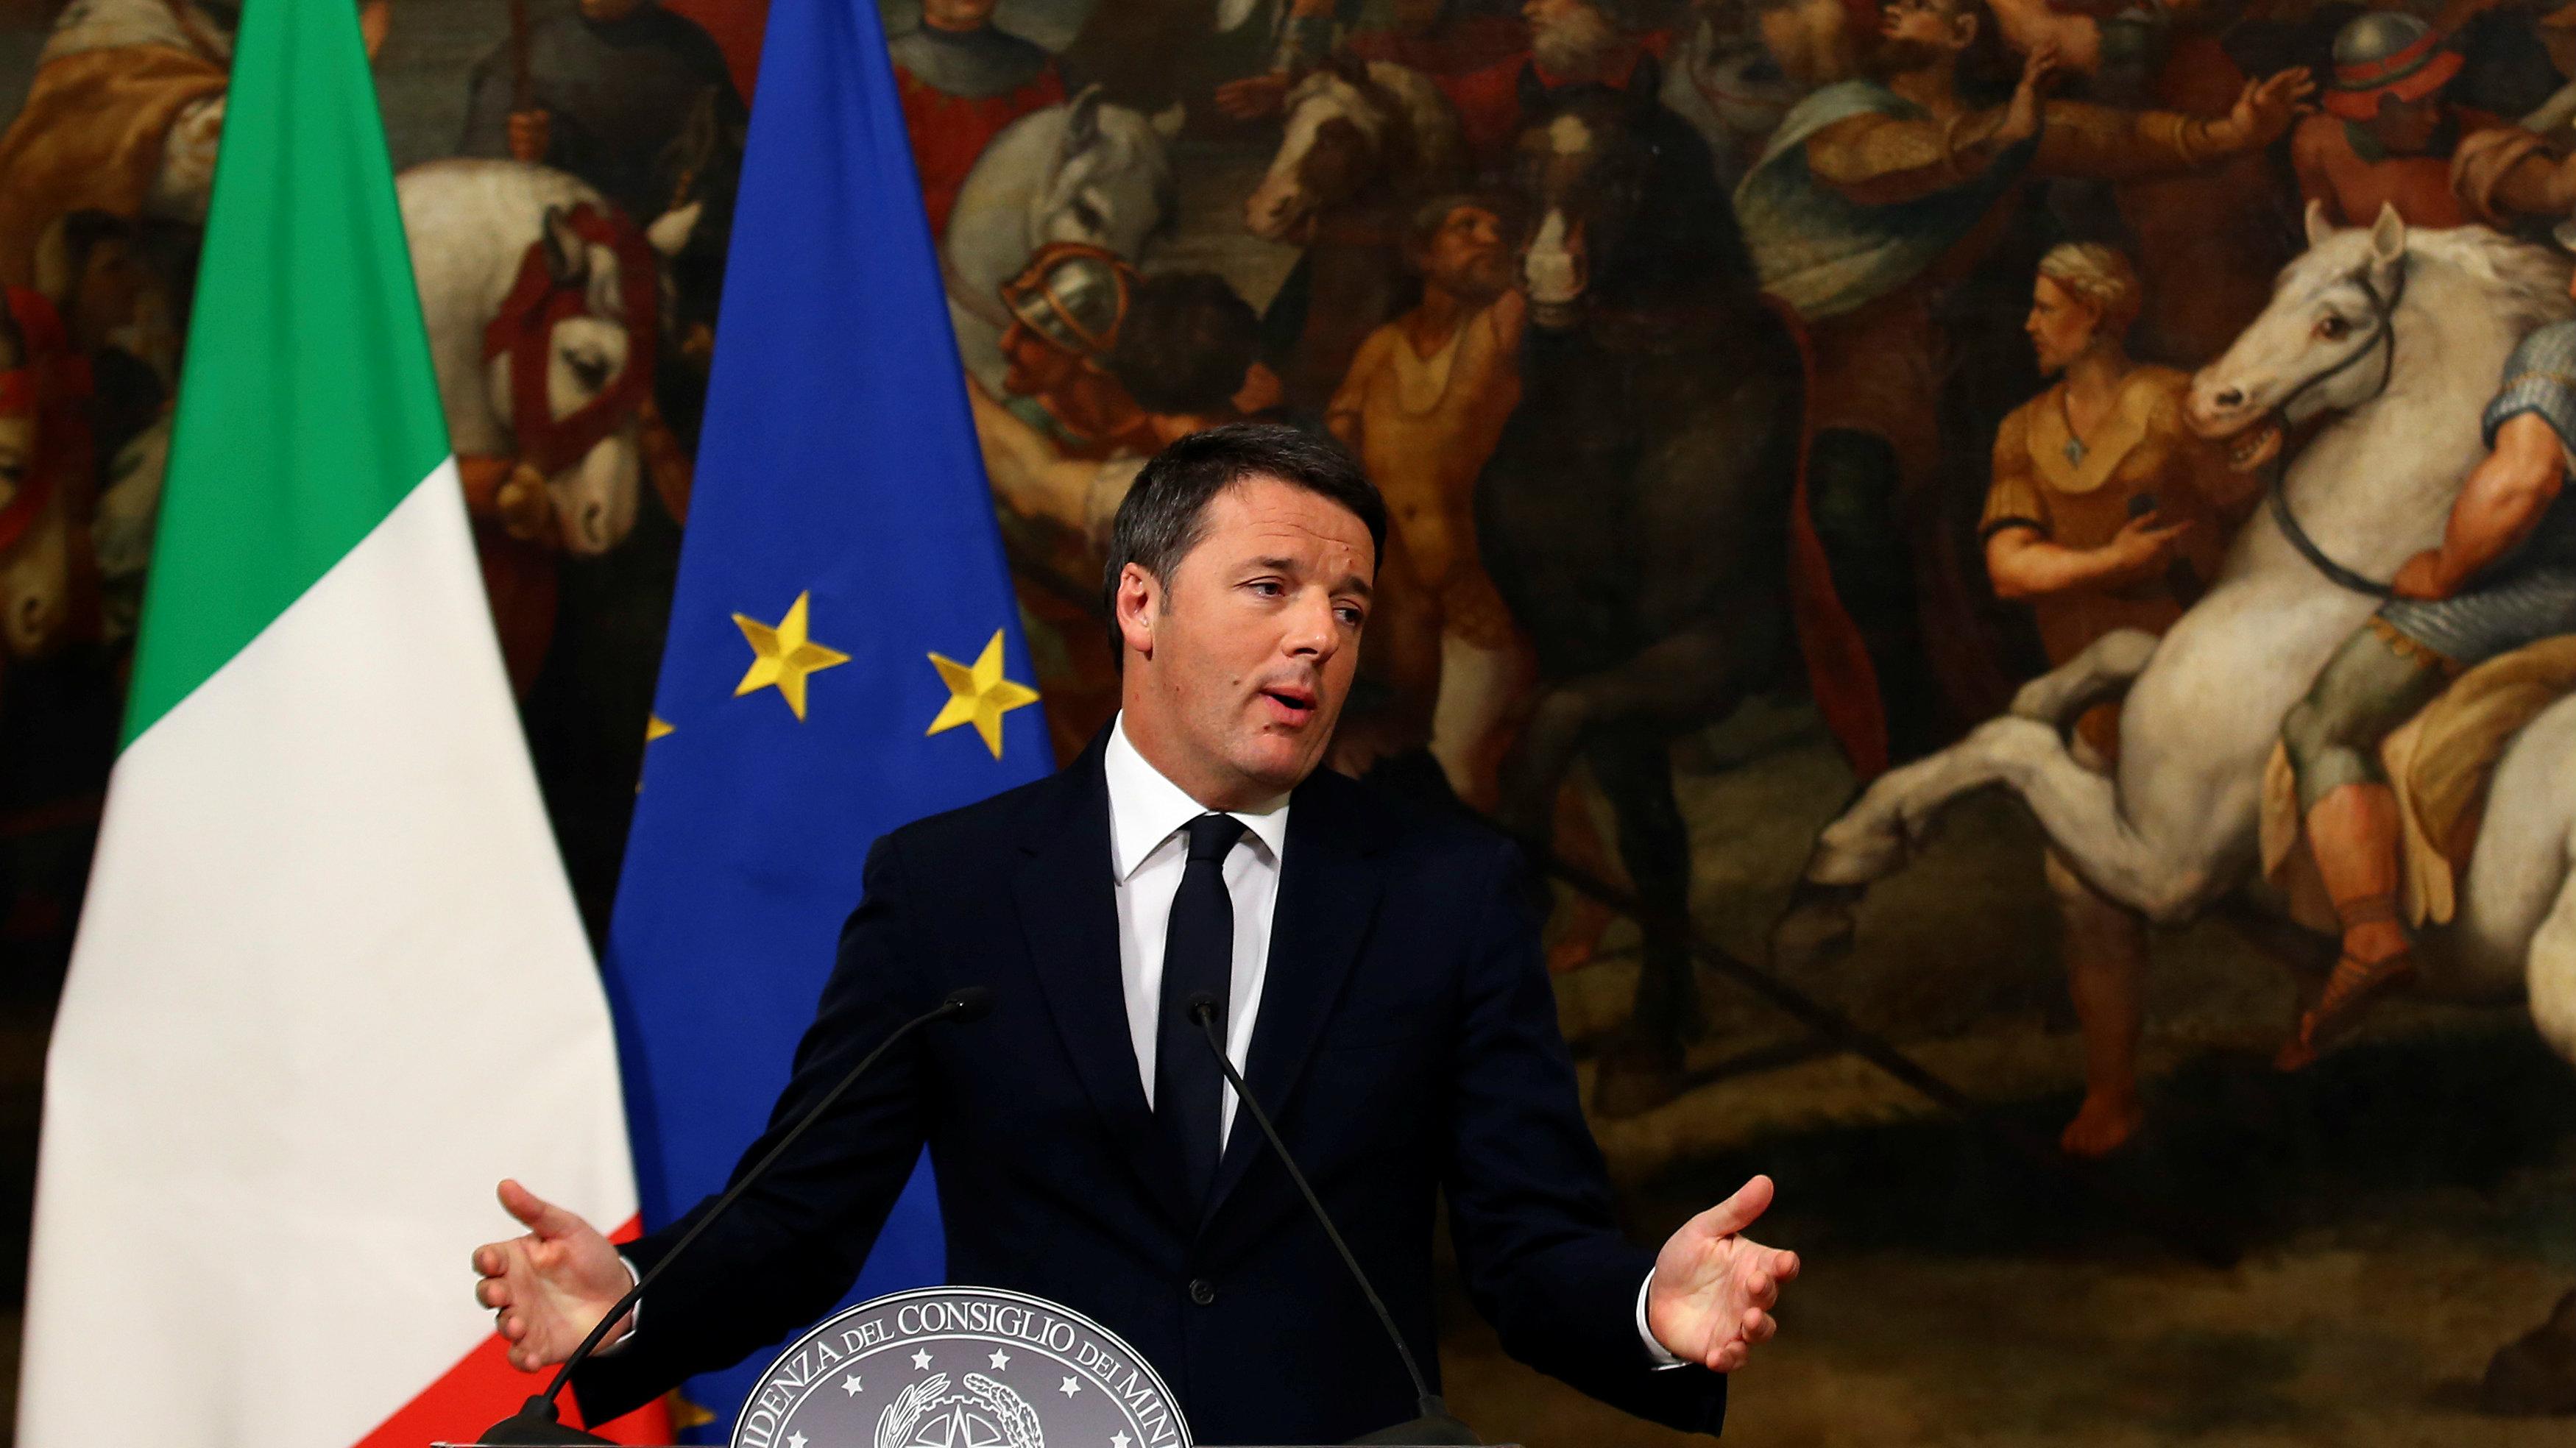 Matteo Renzi resigns as Italian prime minister